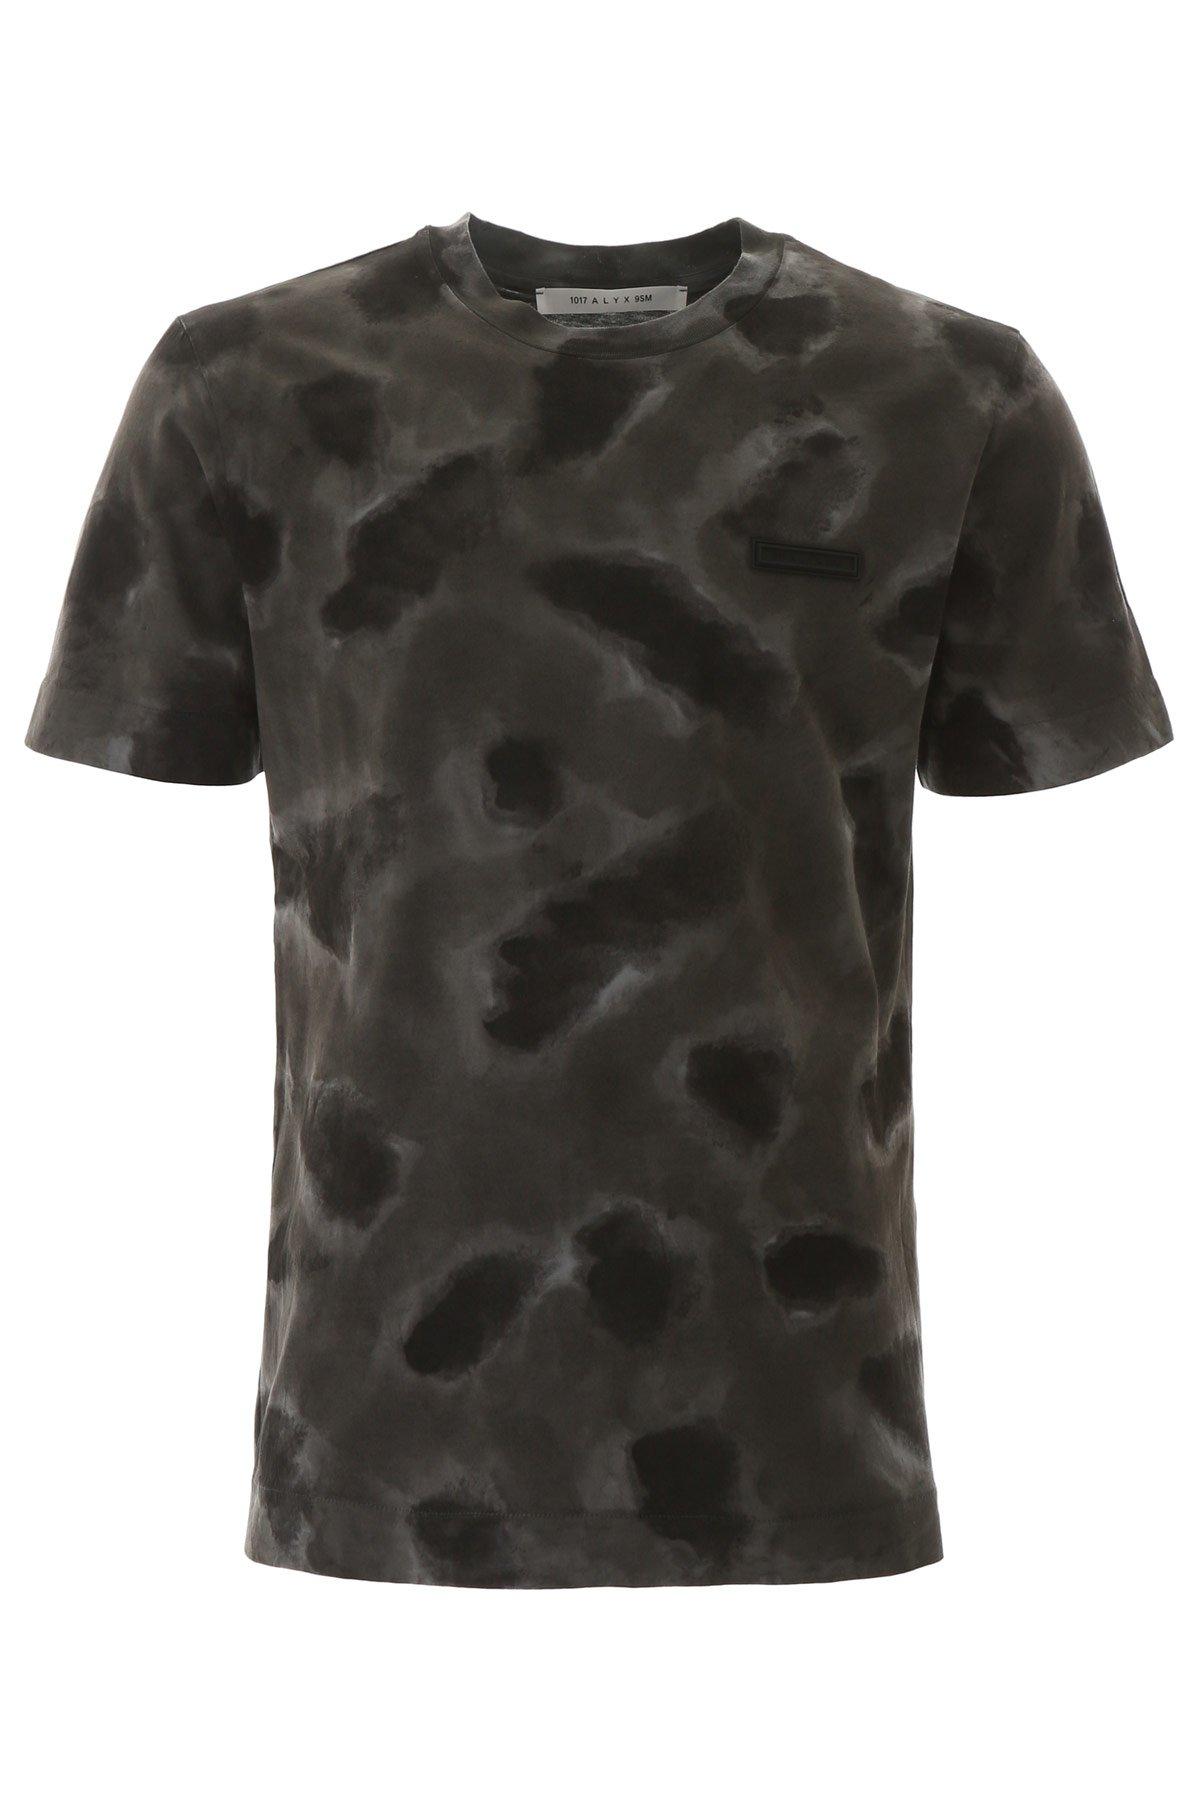 1017 alyx 9sm t-shirt camouflage stampa logo